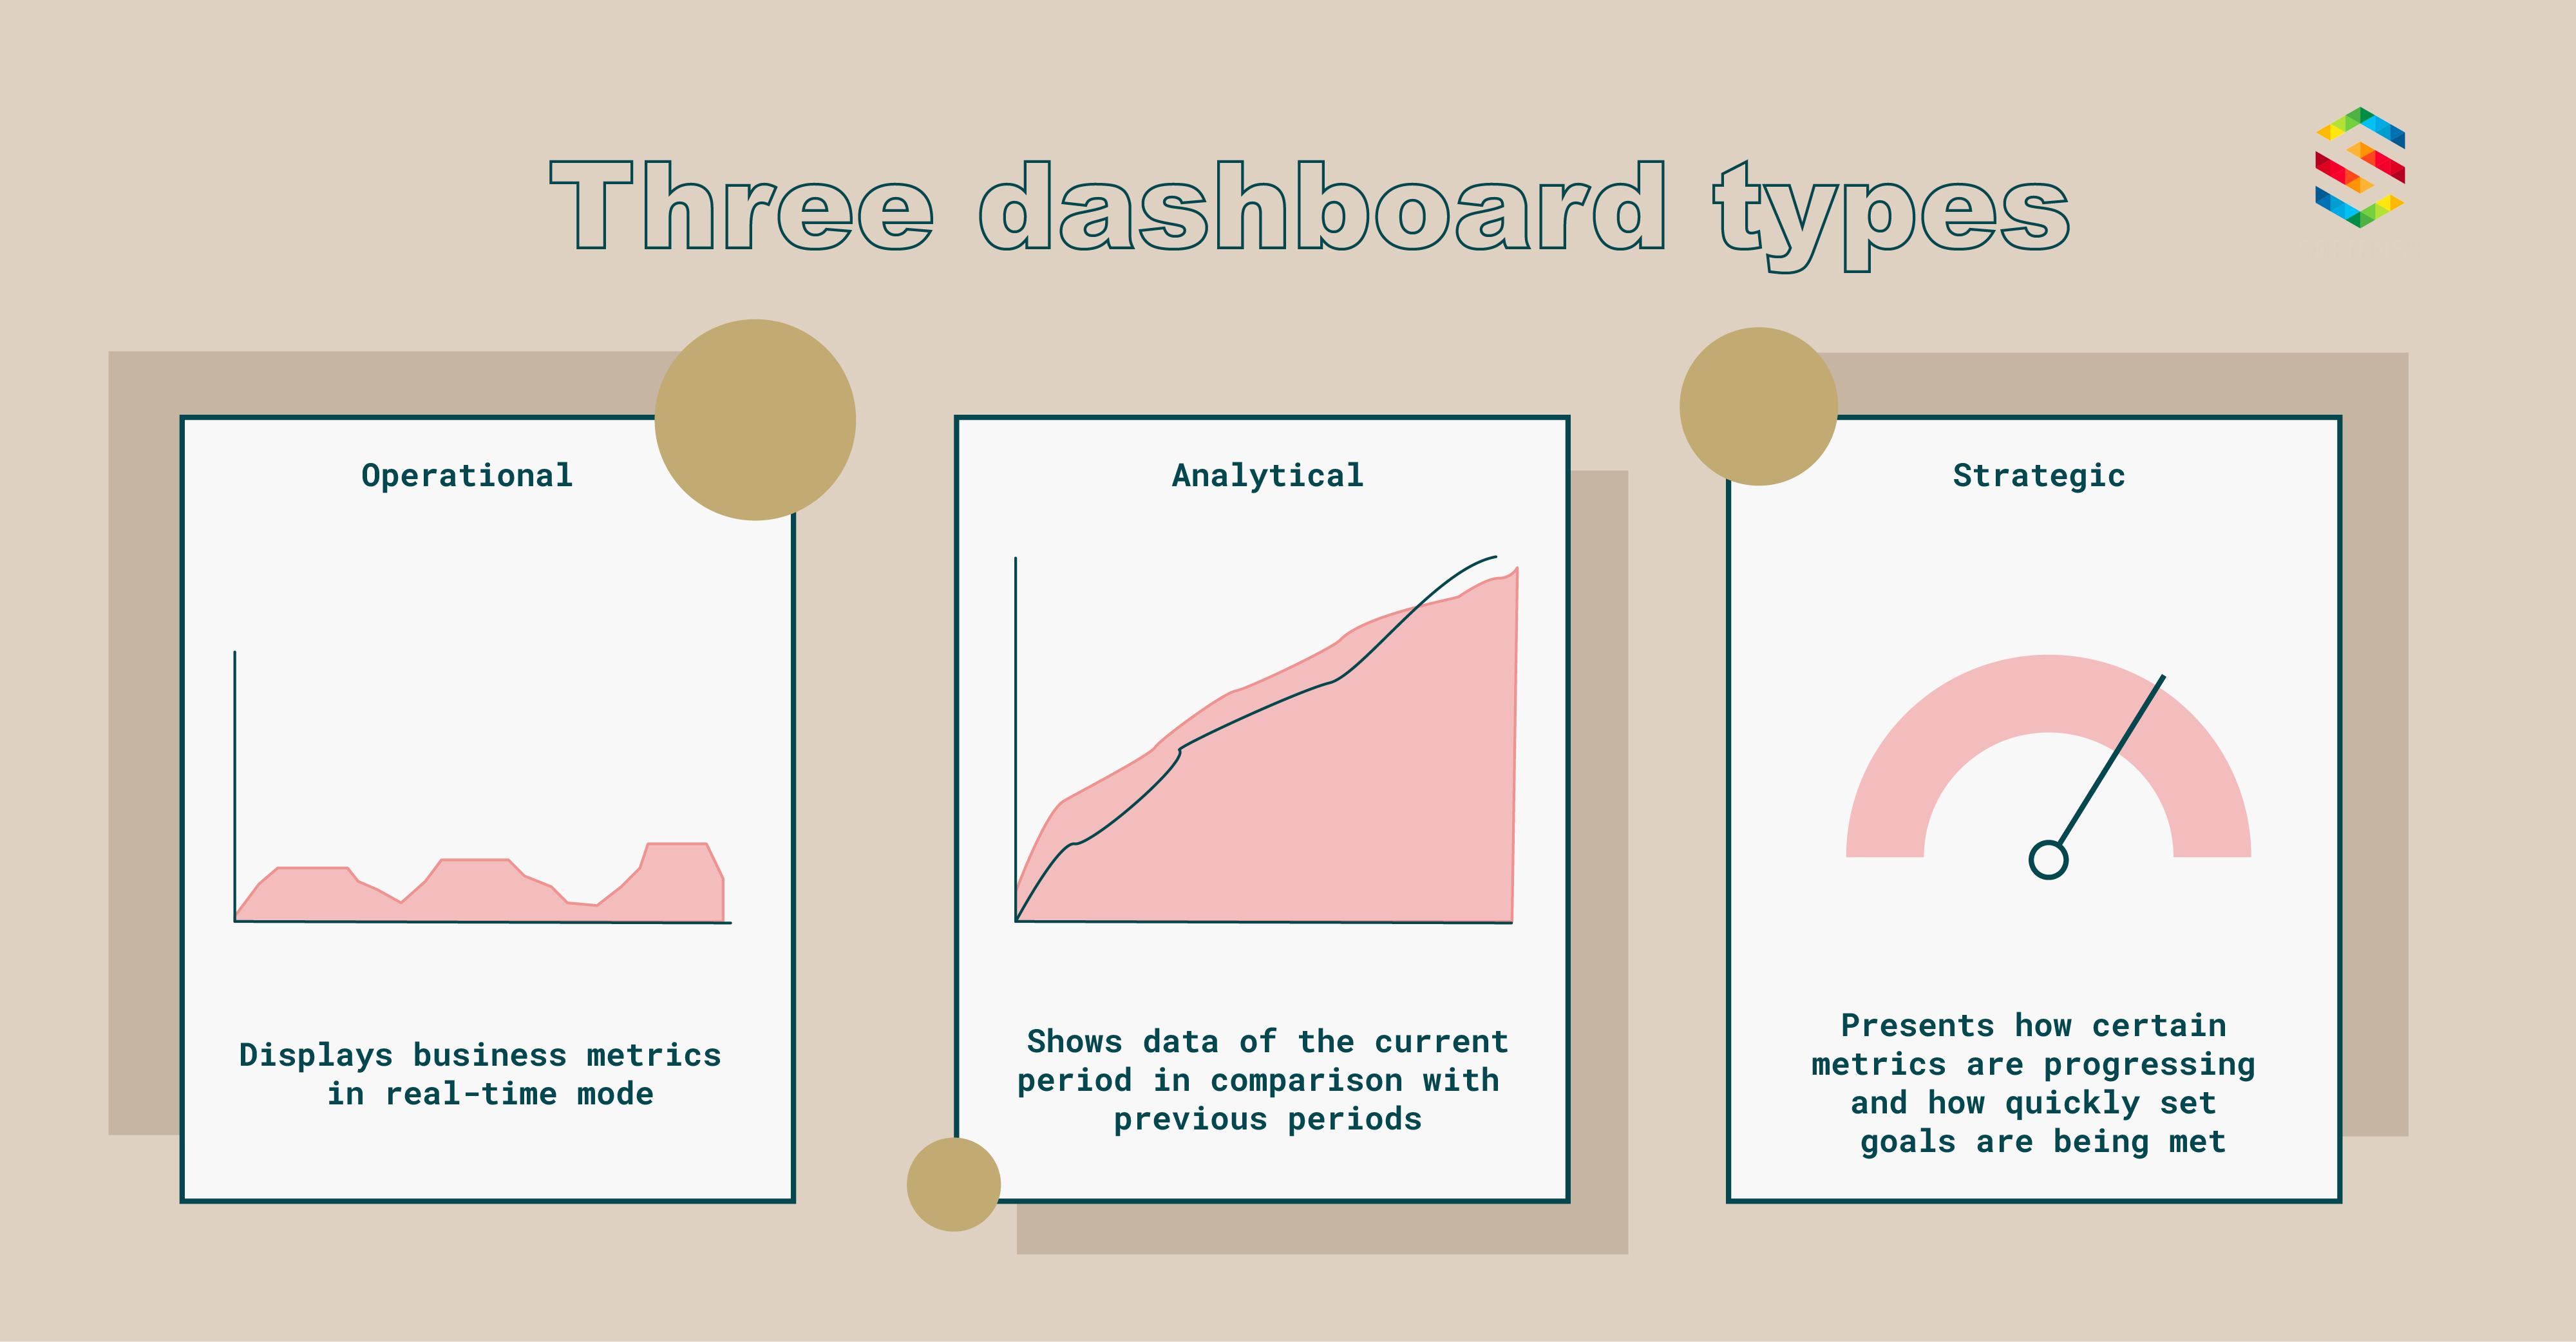 Dashboard types